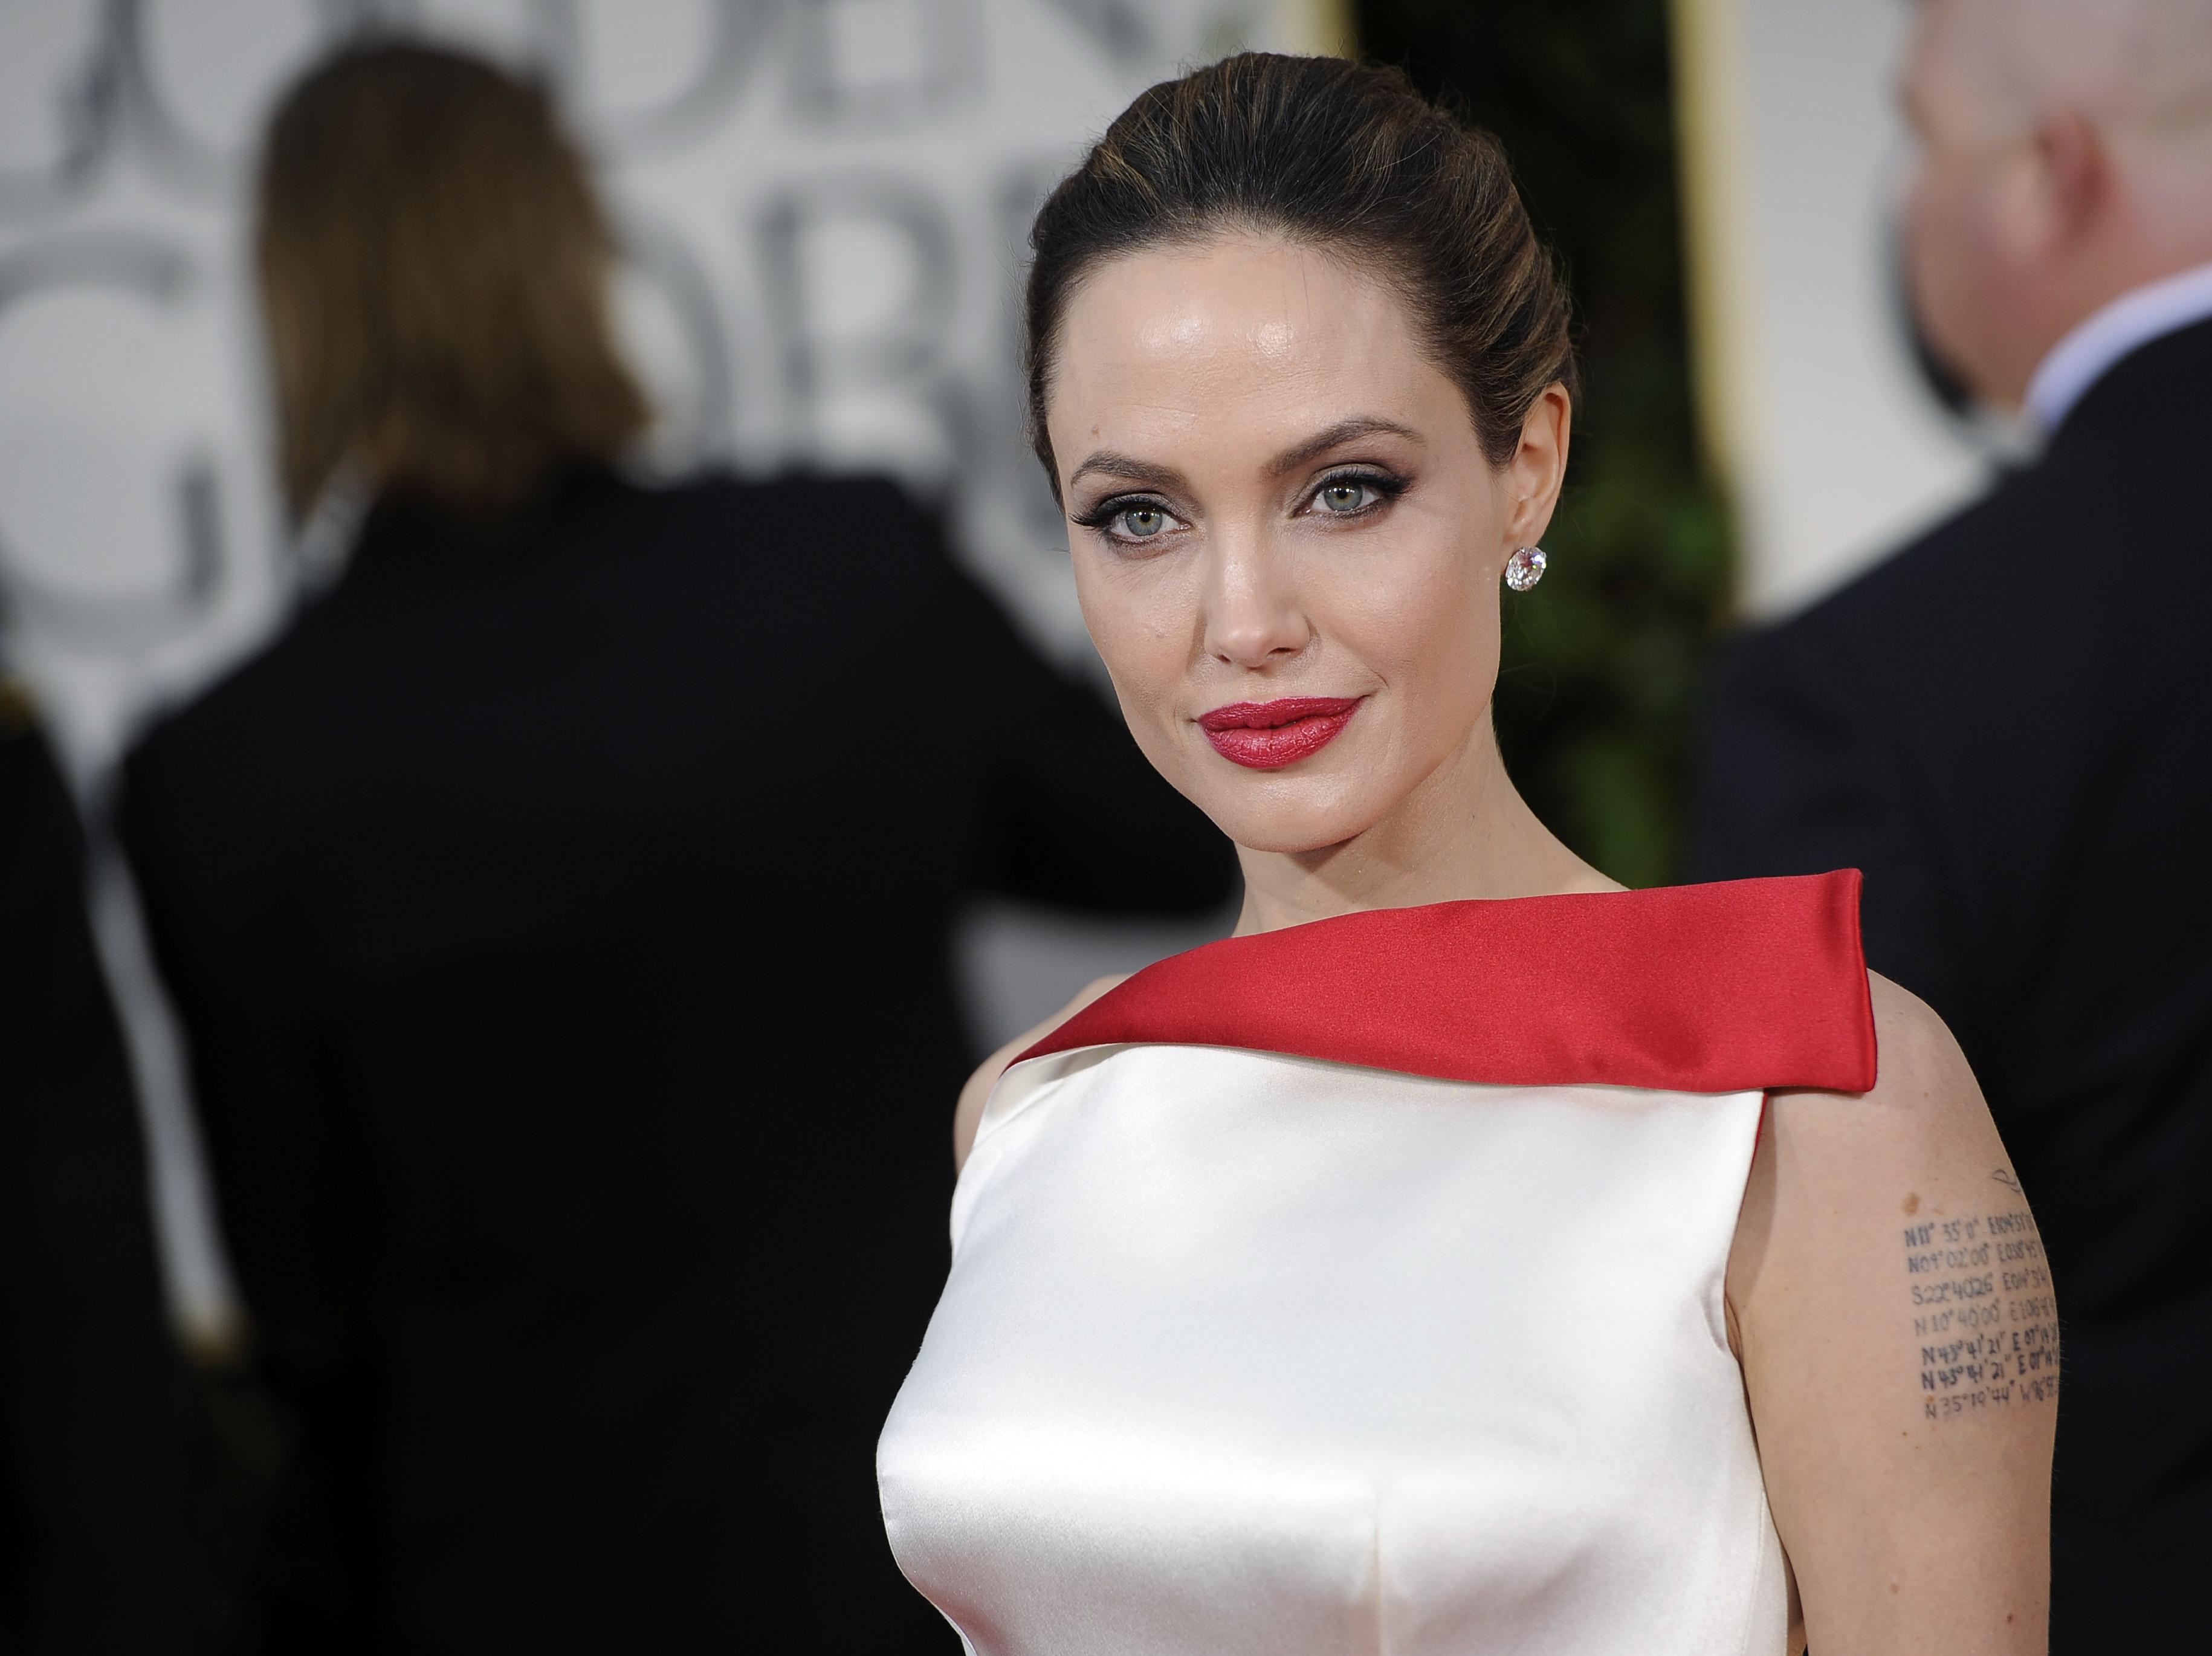 Актриса Анджелина Джоли предпочитает макияж со стрелками